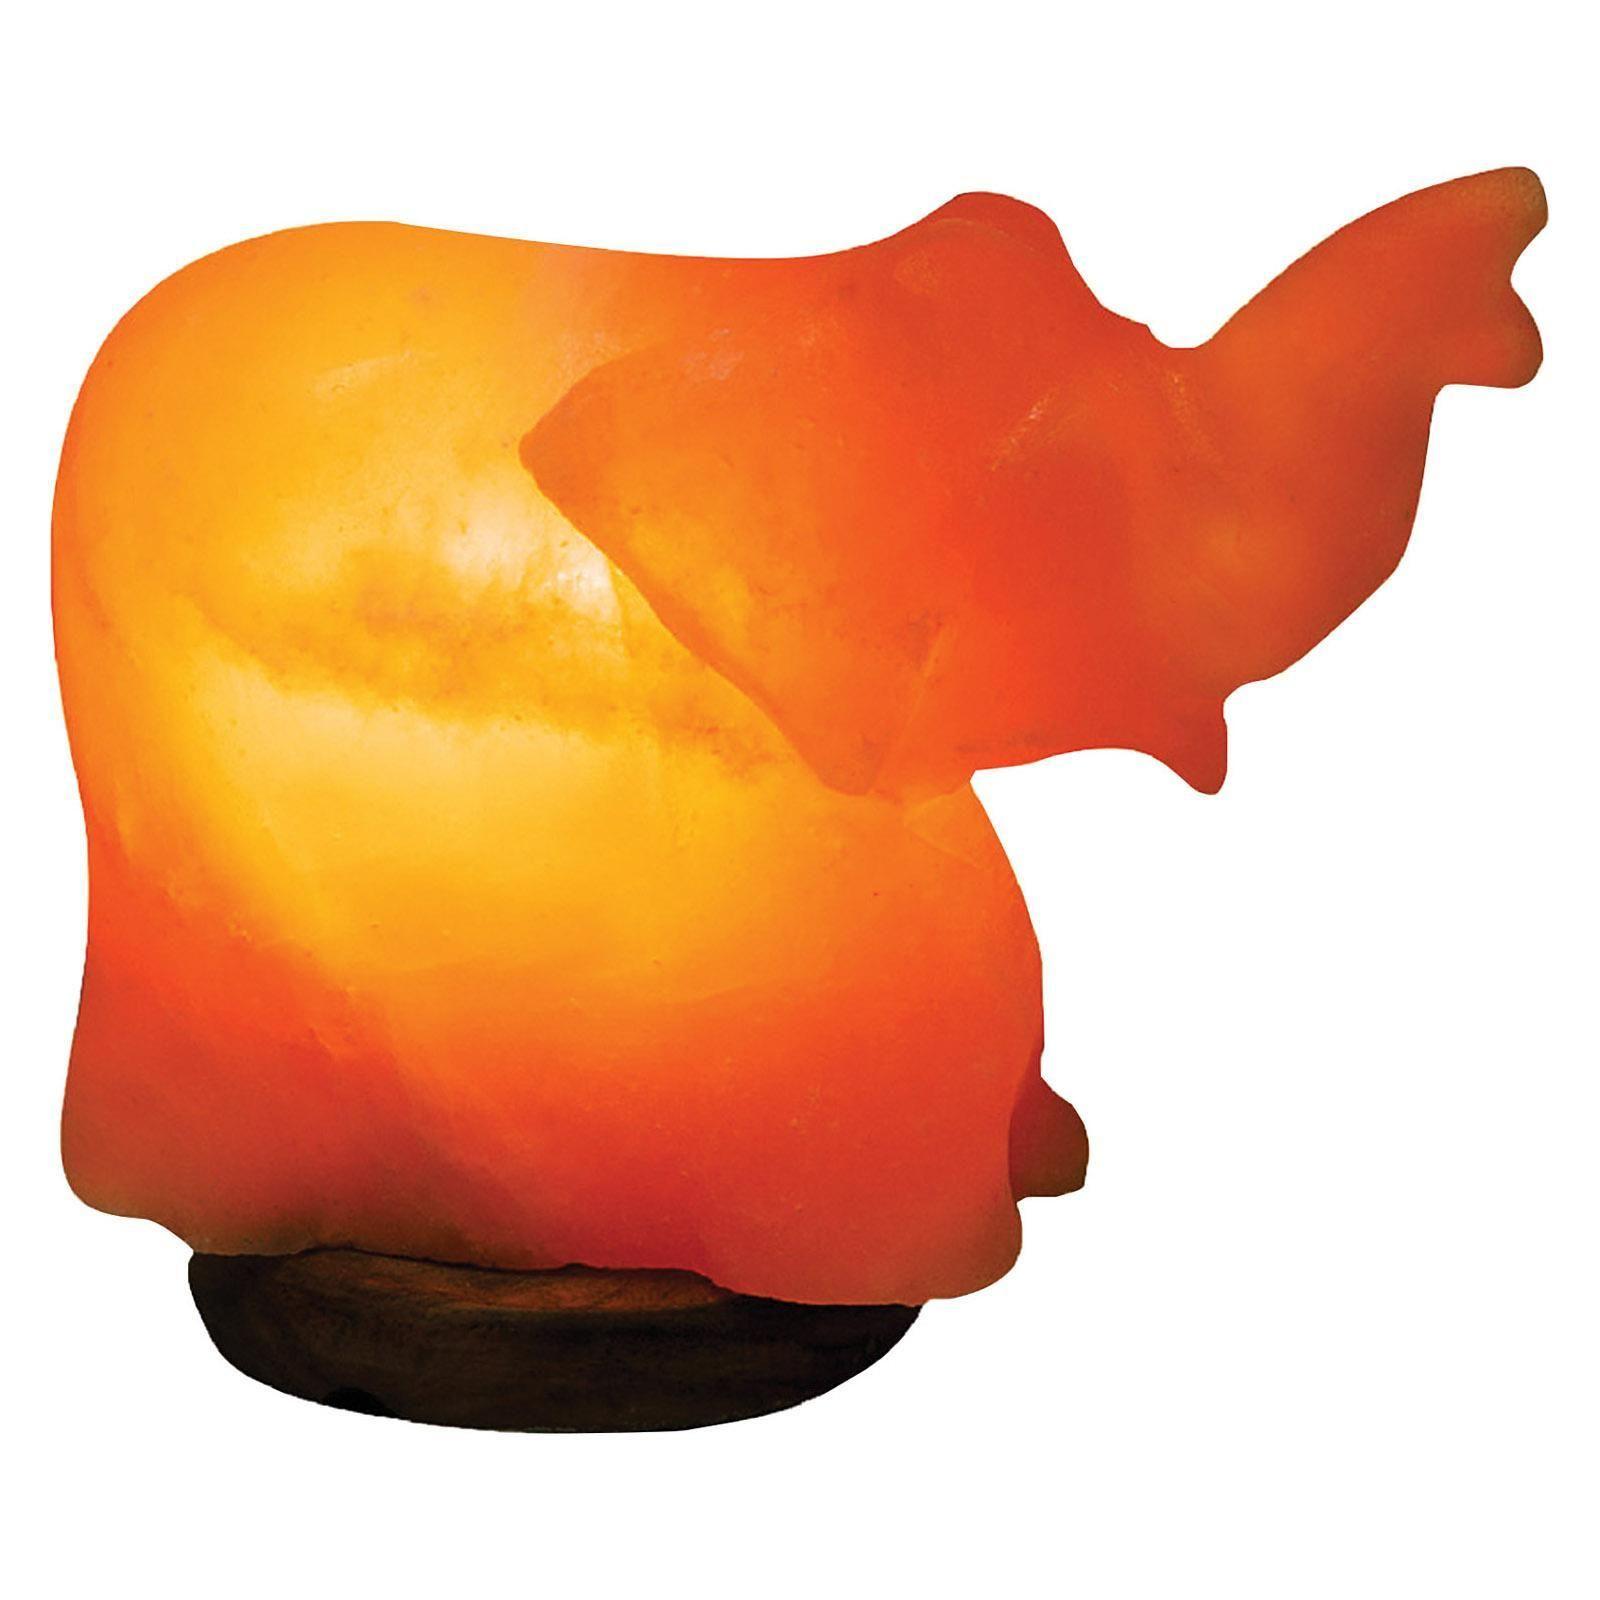 Evolution Salt Crystal Salt Lamp Elephant 1 Count Salt Lamp